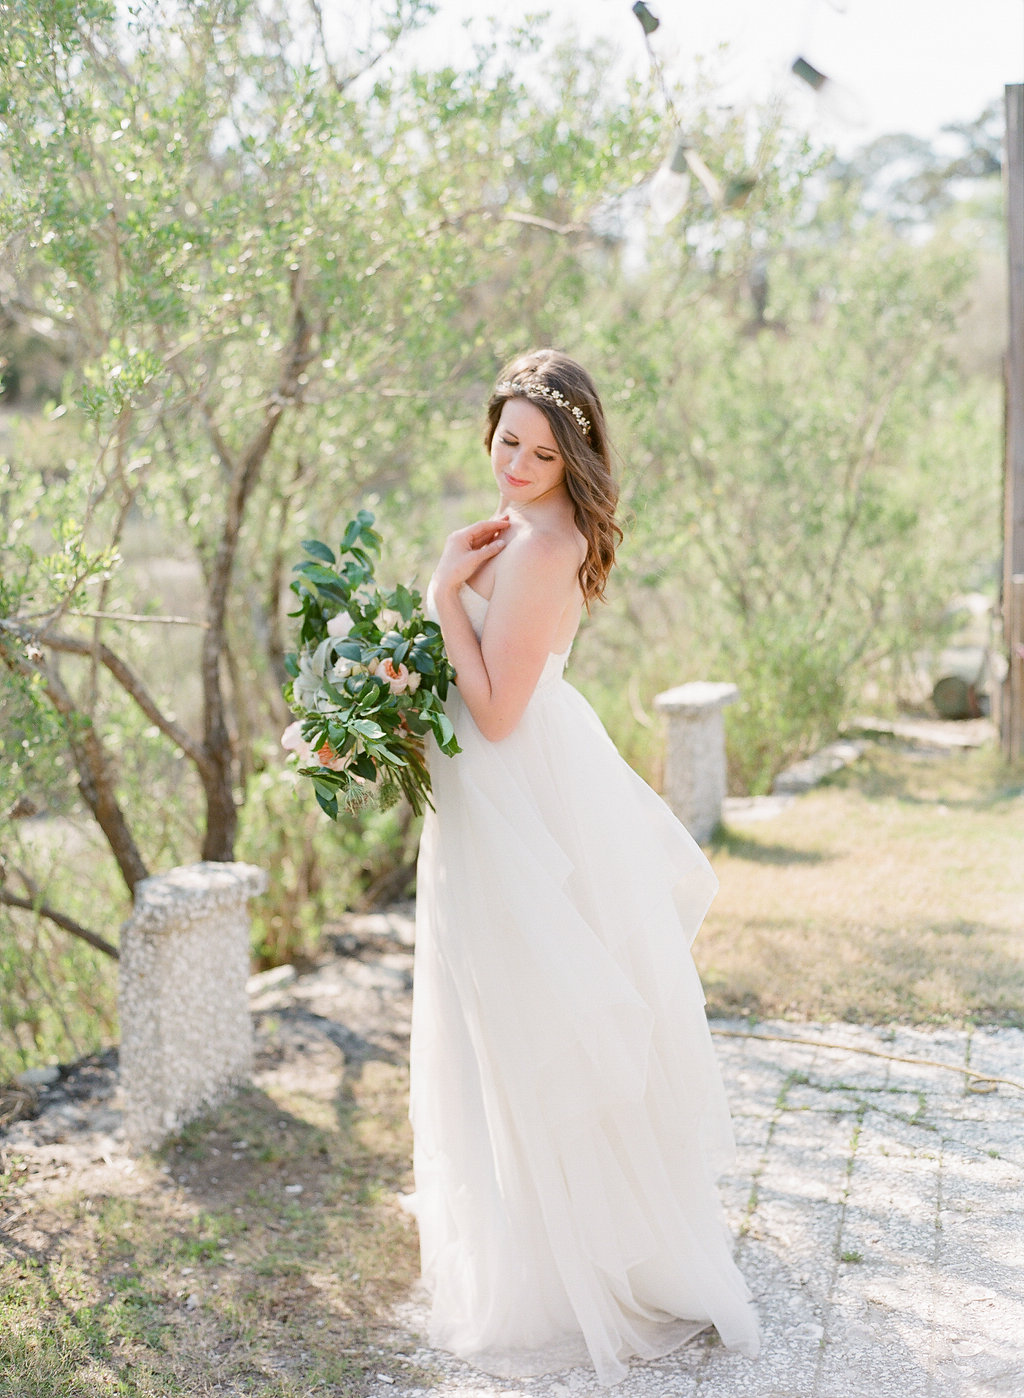 sarah-seven-worthington-wedding-dress-ivory-and-beau-savannah-wedding-planner-savannah-bridal-boutique-savannah-wedding-dresses-bohemian-wedding-dress-romantic-wedding-dress-strapless-organza-romantic-wedding-dress.jpg